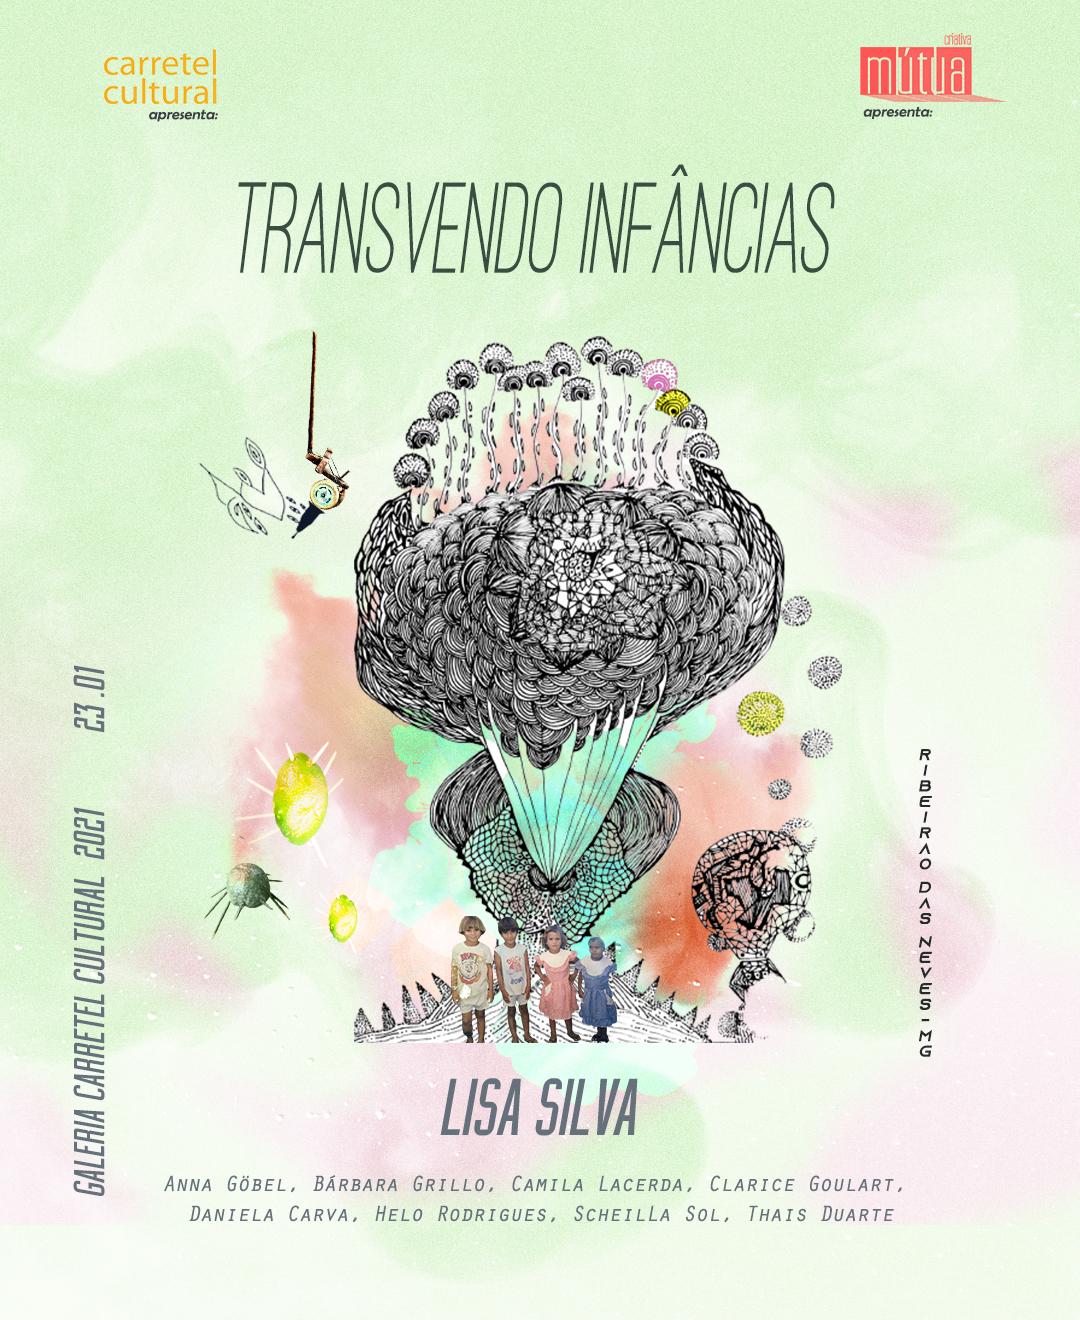 Lisa Silva